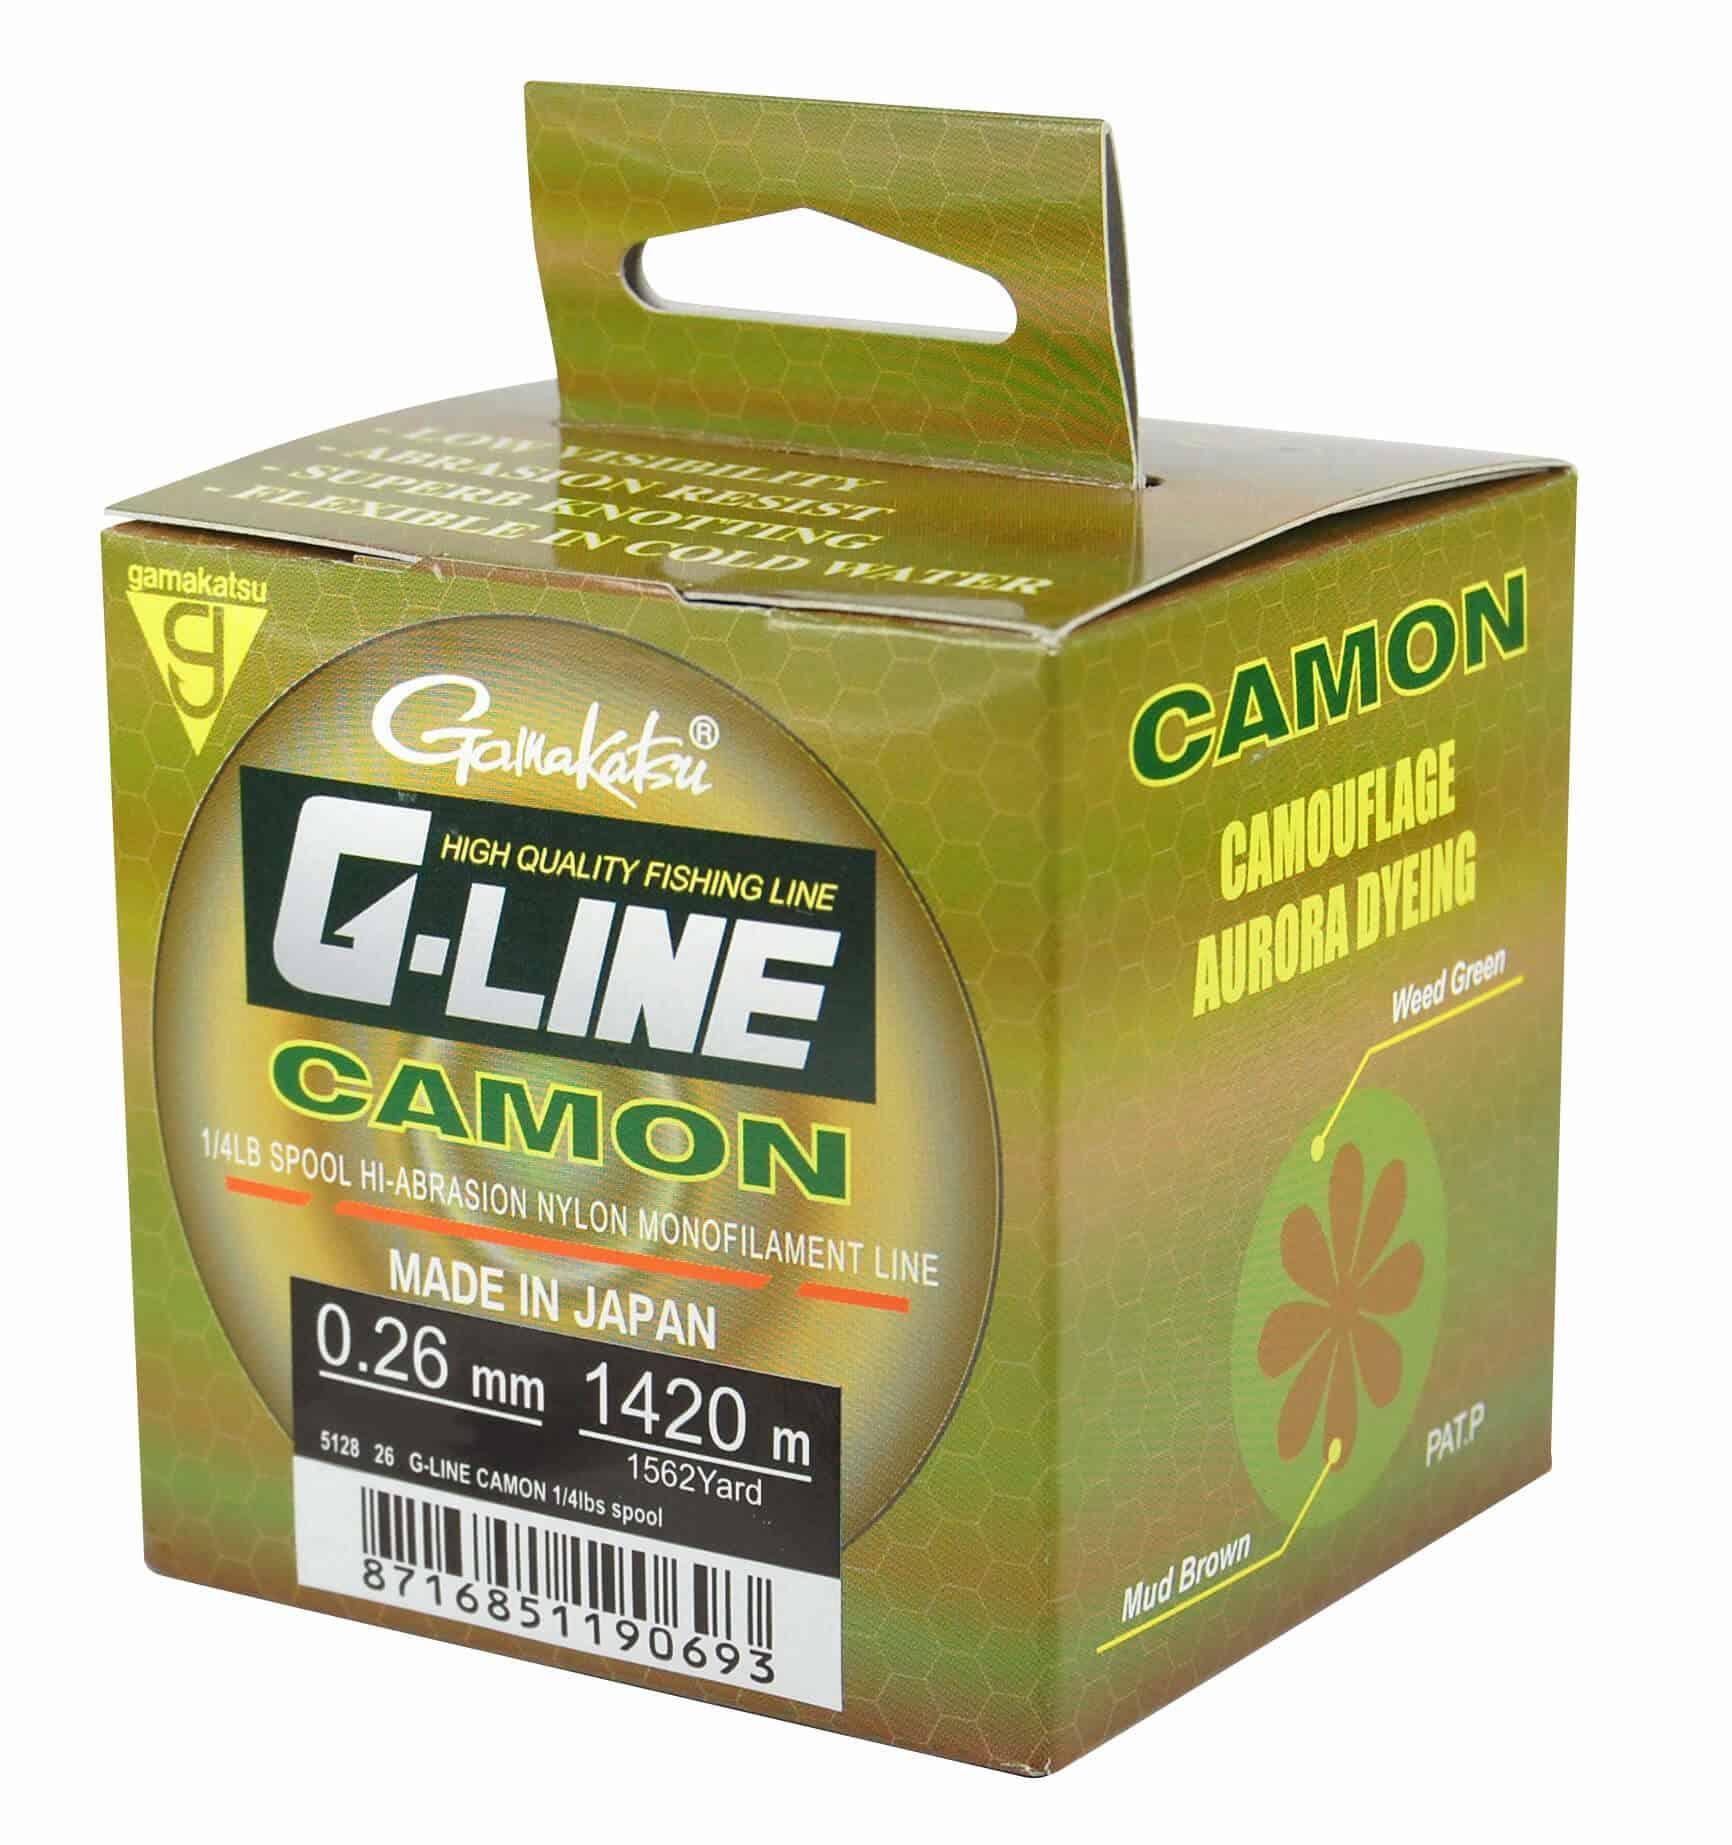 g-line-camon